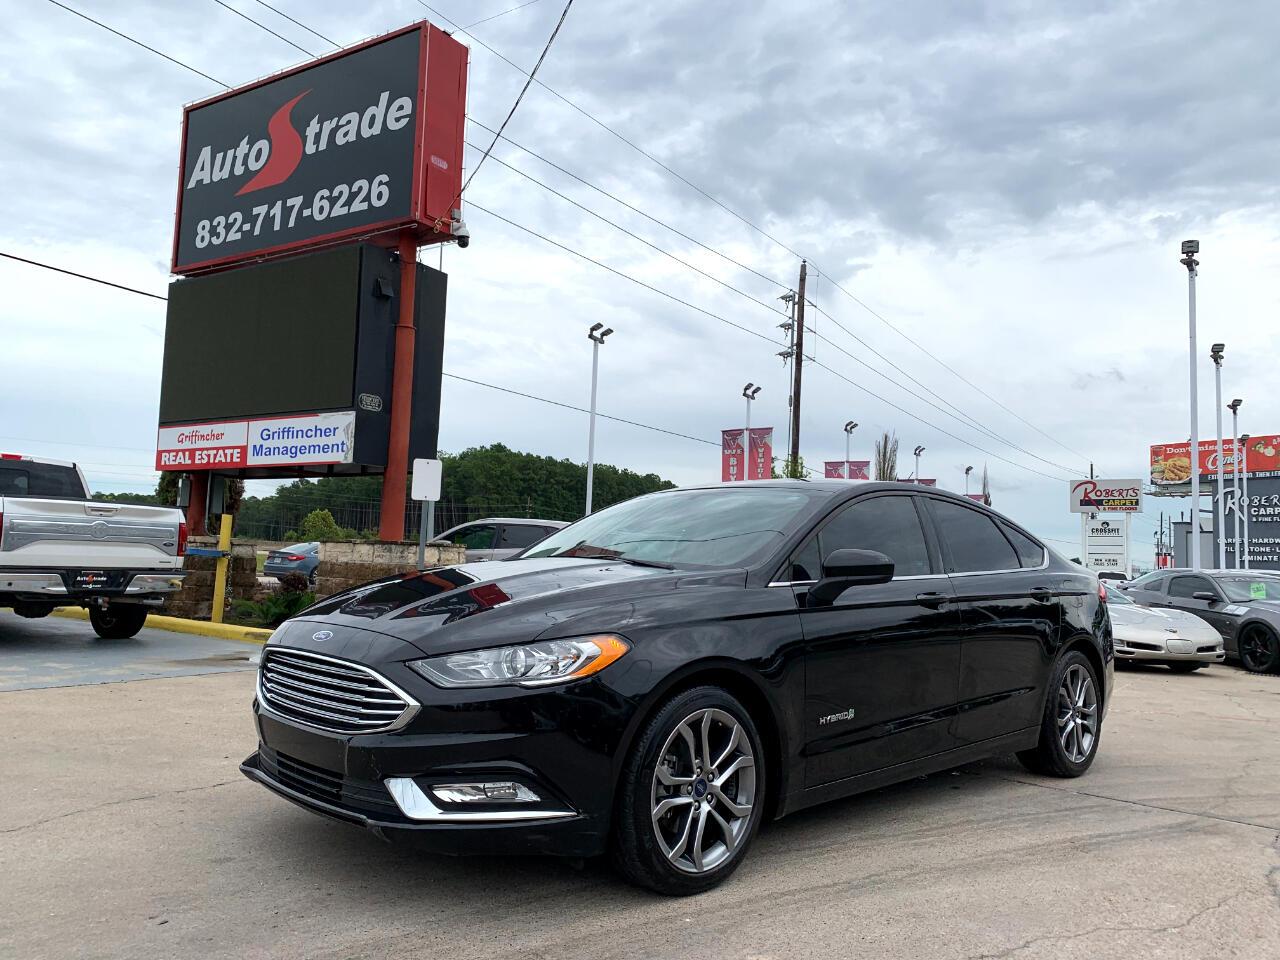 Ford Fusion Hybrid SE FWD 2017